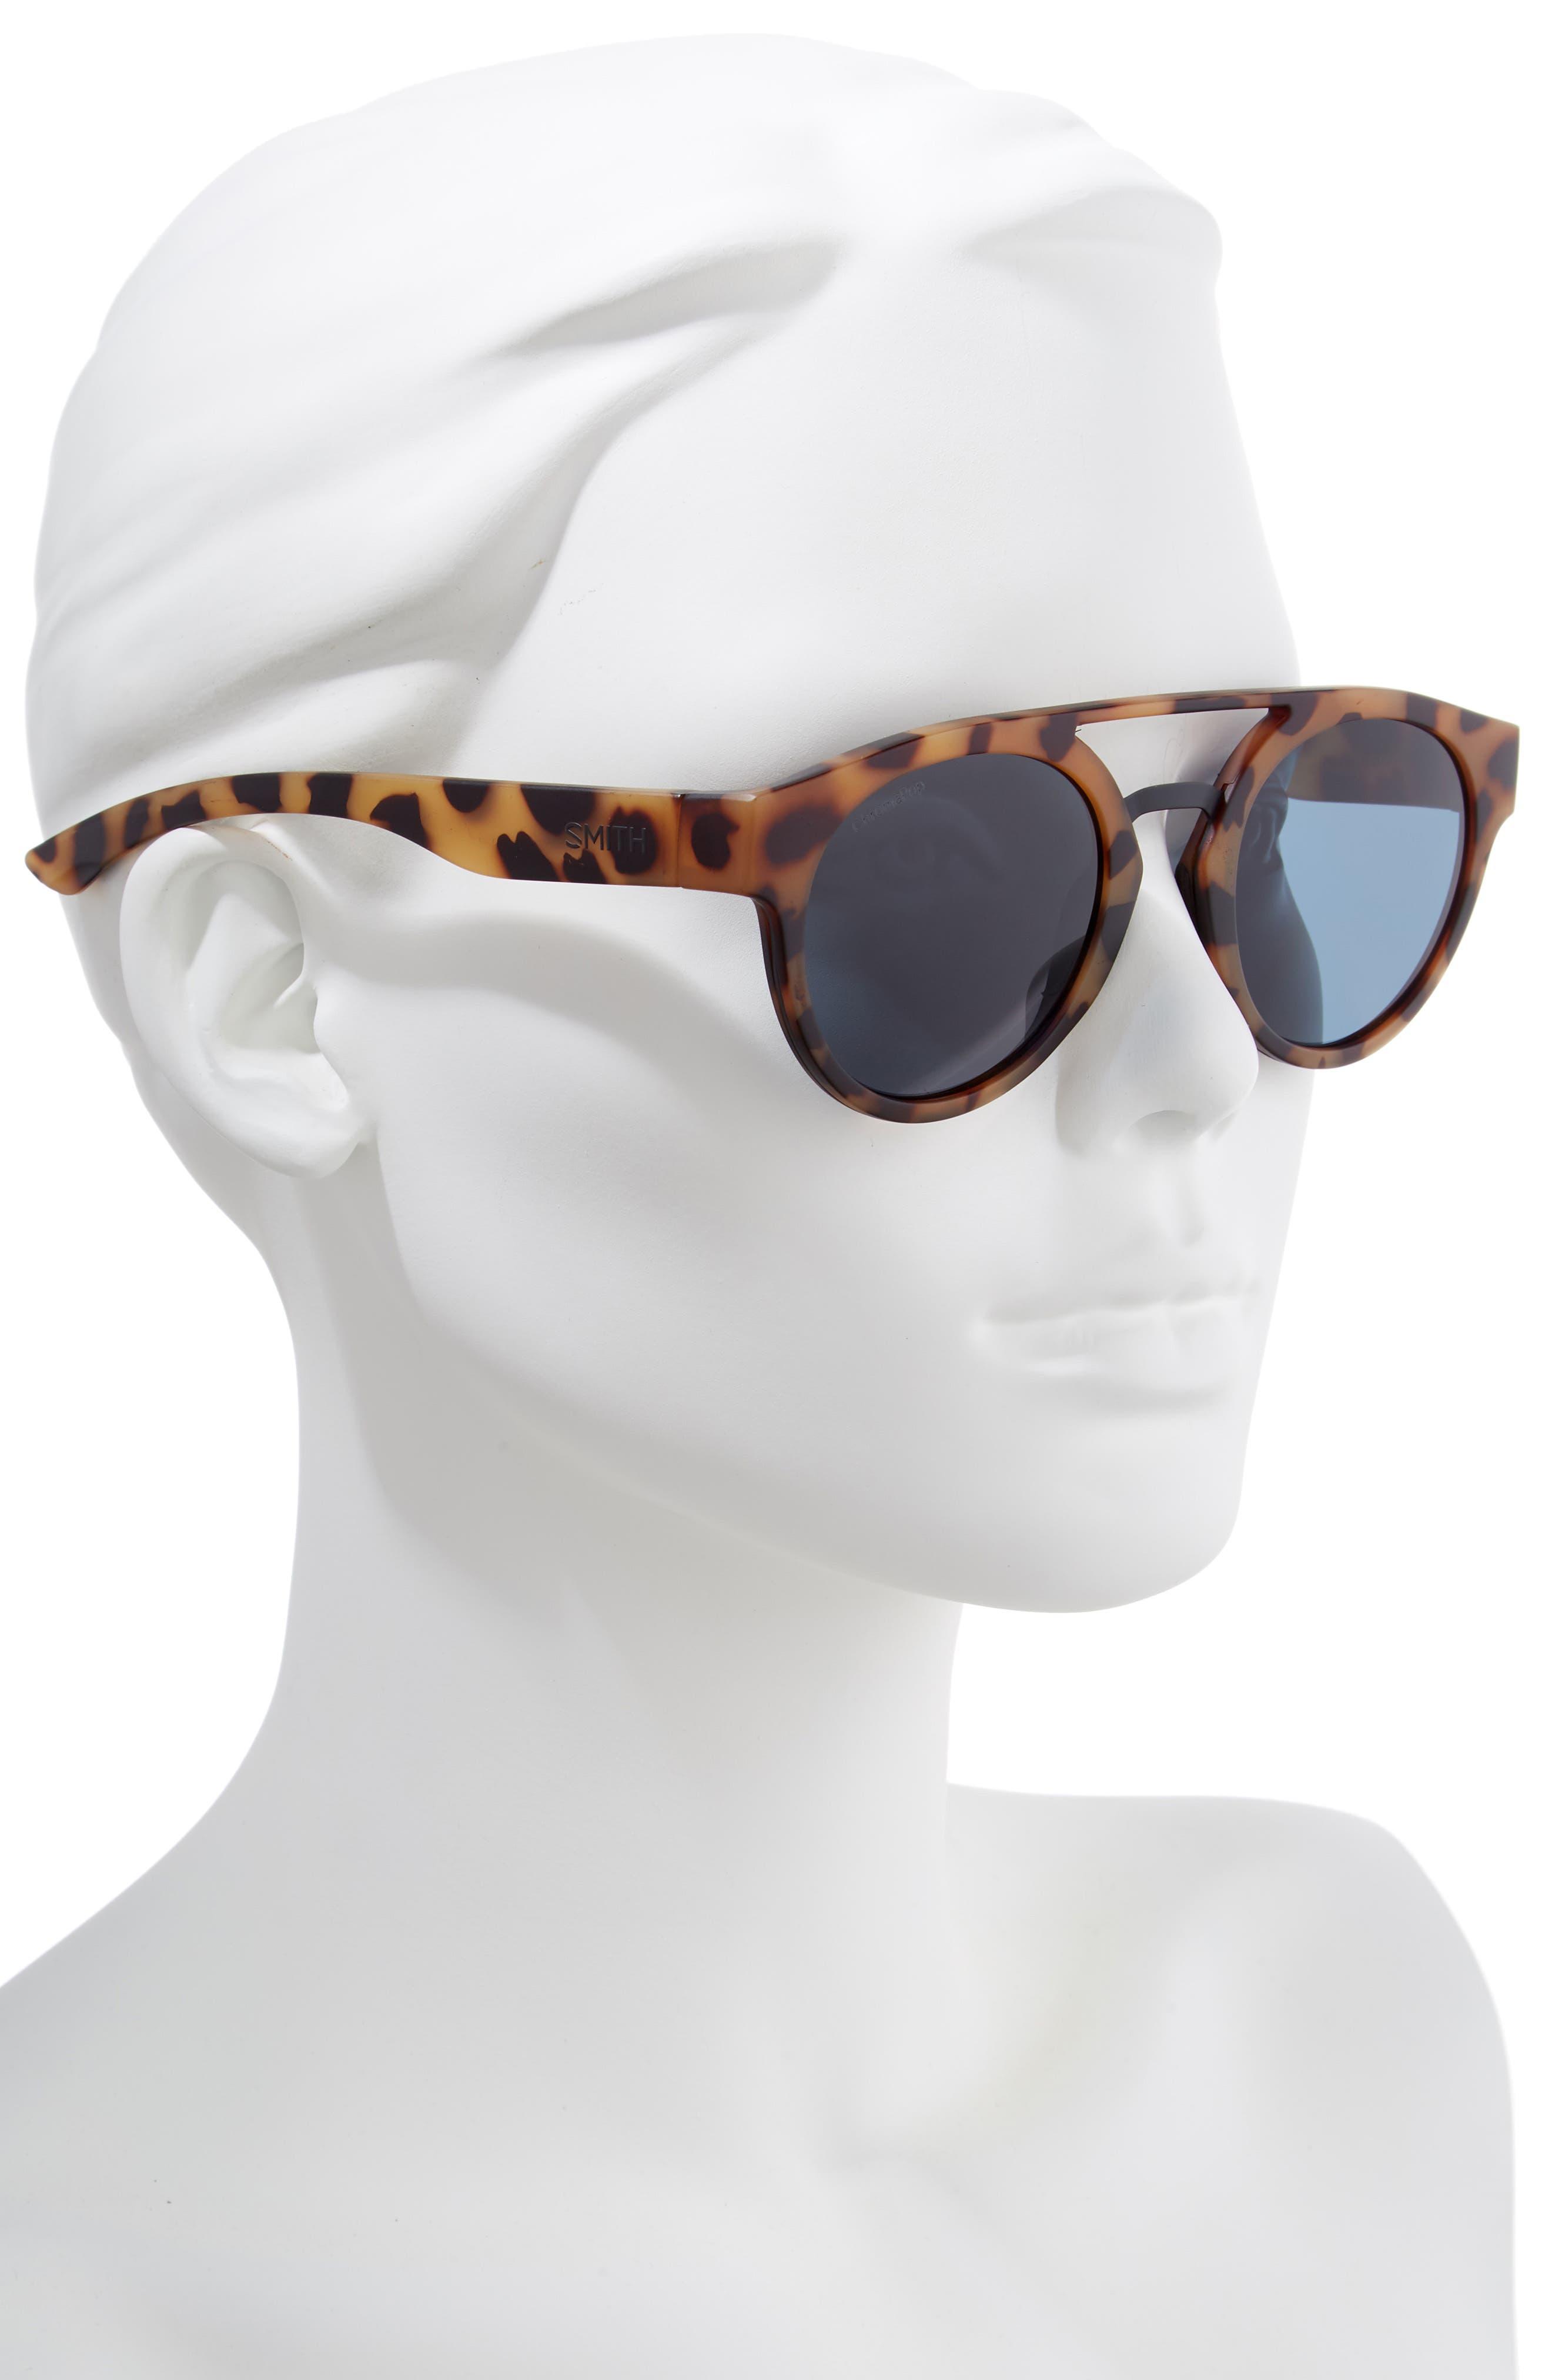 Range 50mm ChromaPop<sup>™</sup> Polarized Sunglasses,                             Alternate thumbnail 2, color,                             MATTE HONEY TORTOISE/ BLACK